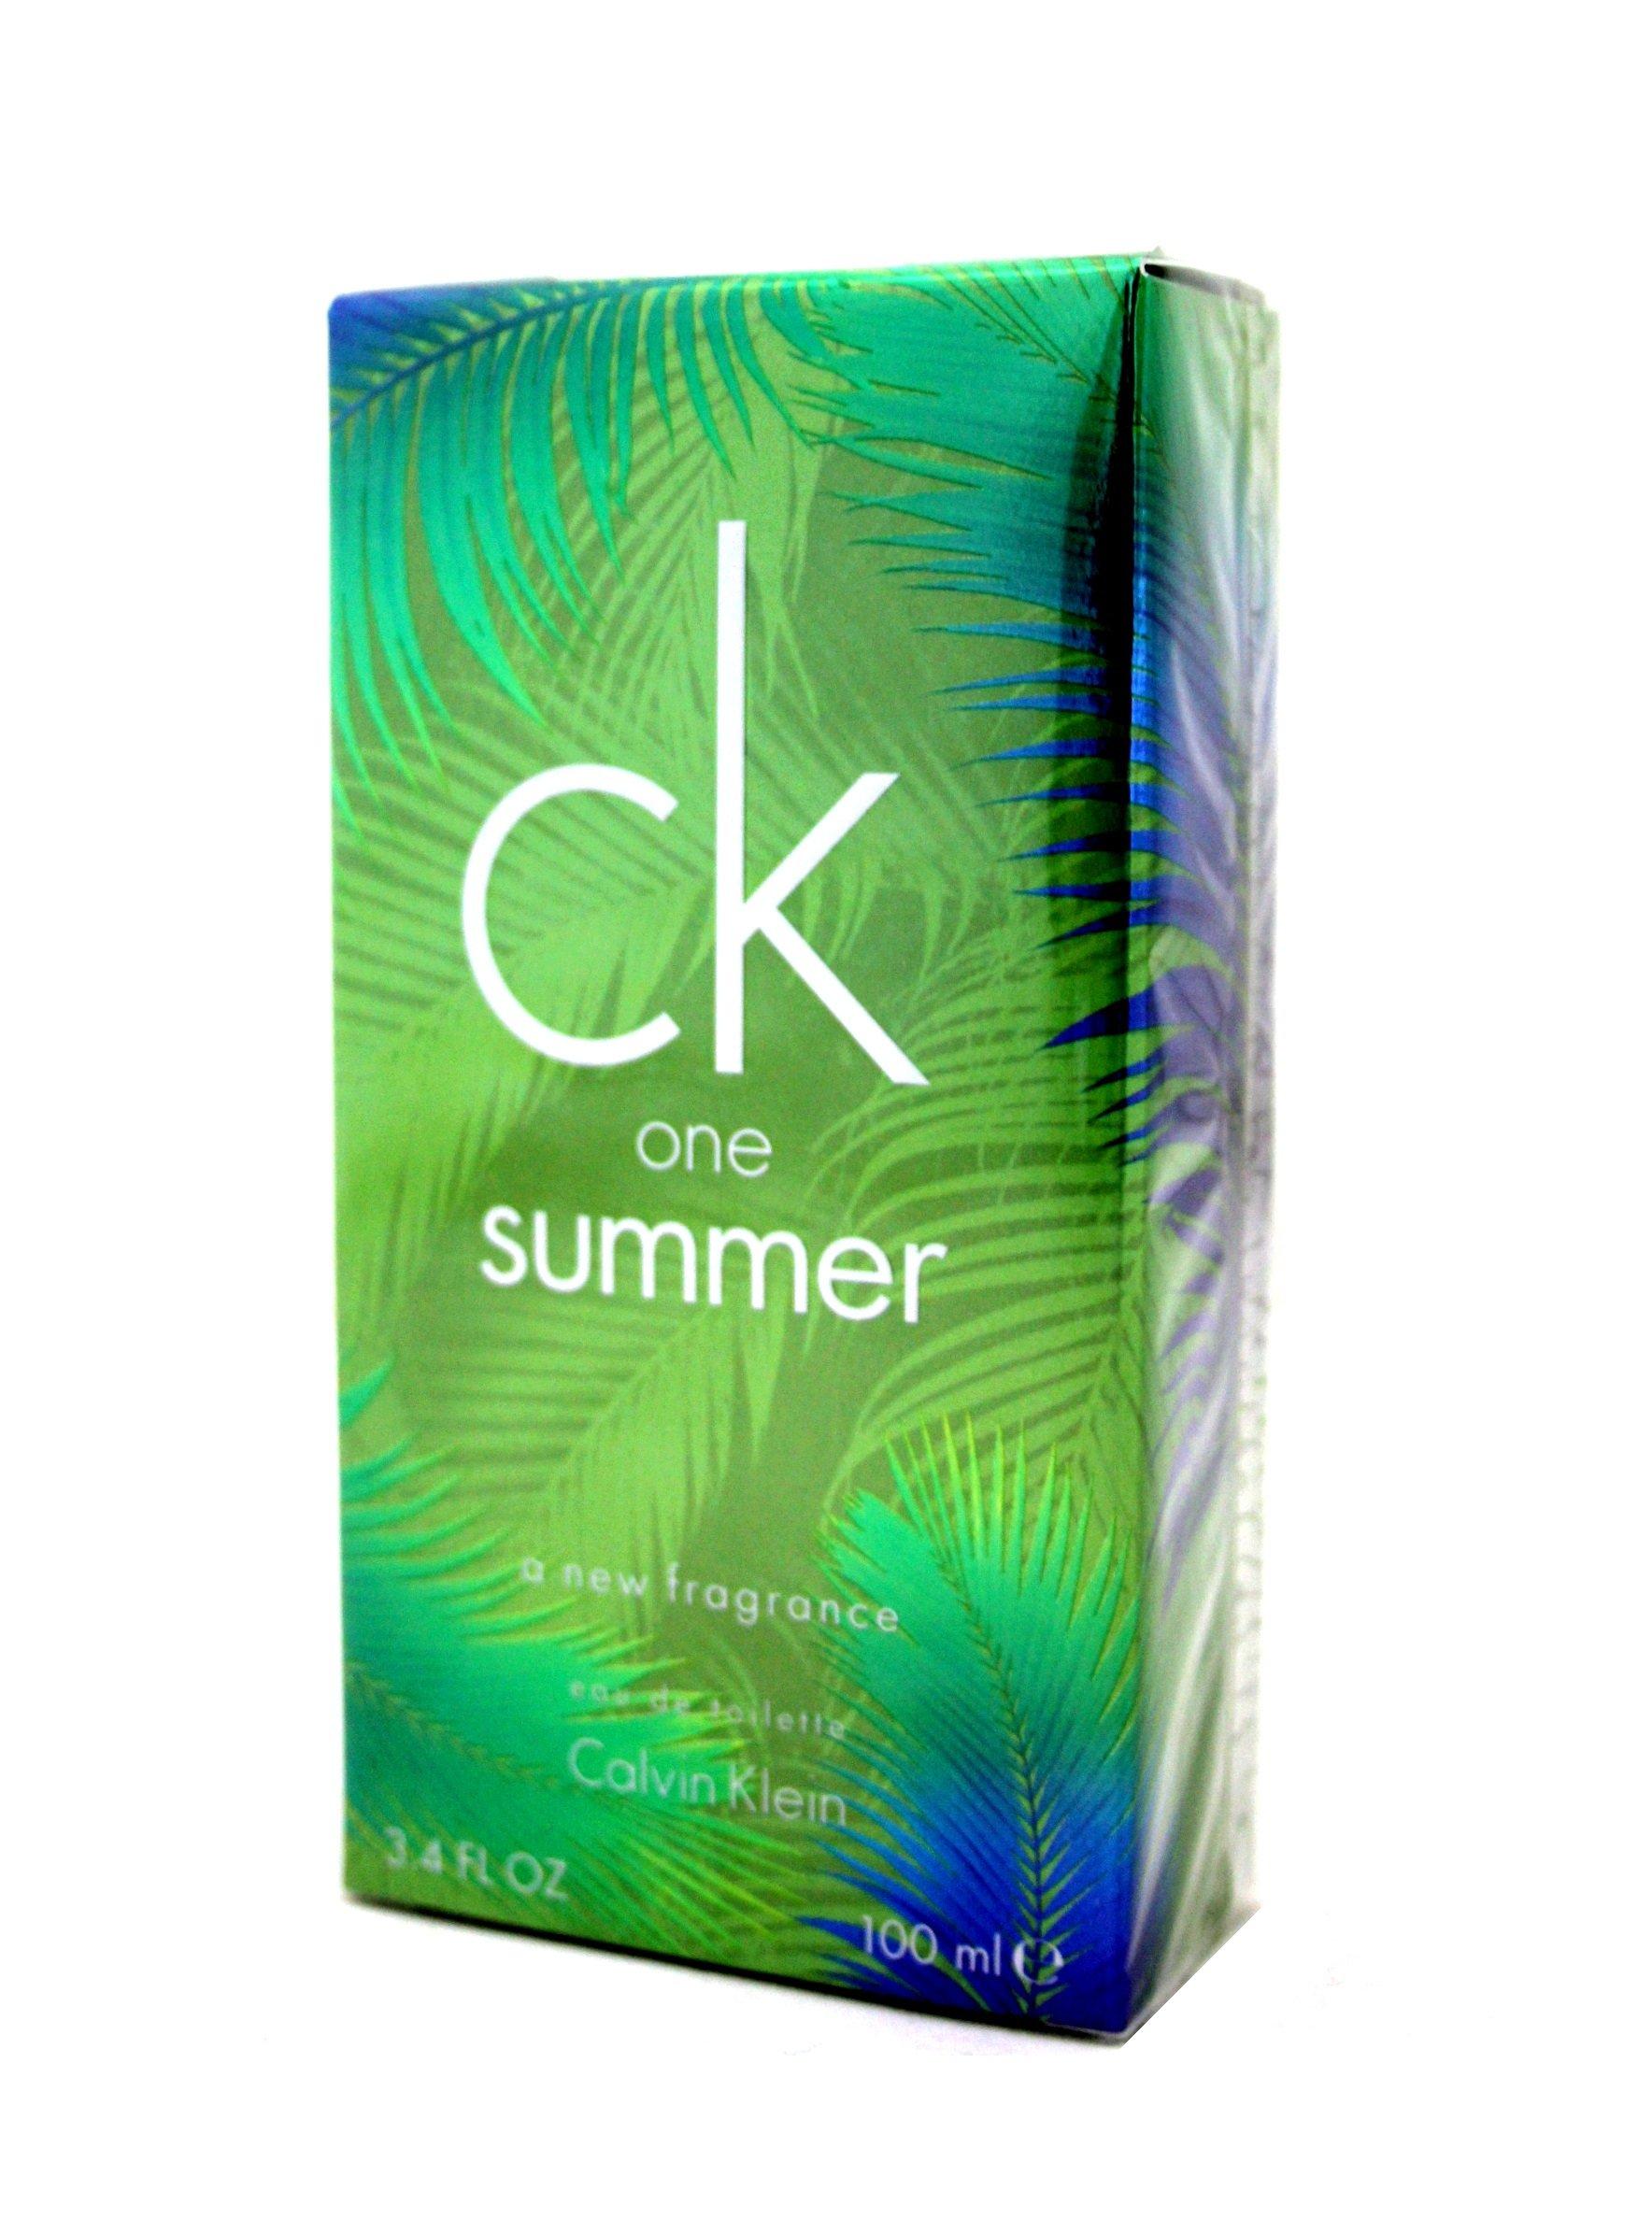 Calvin Klein CK One Summer 2016 Eau de Toilette